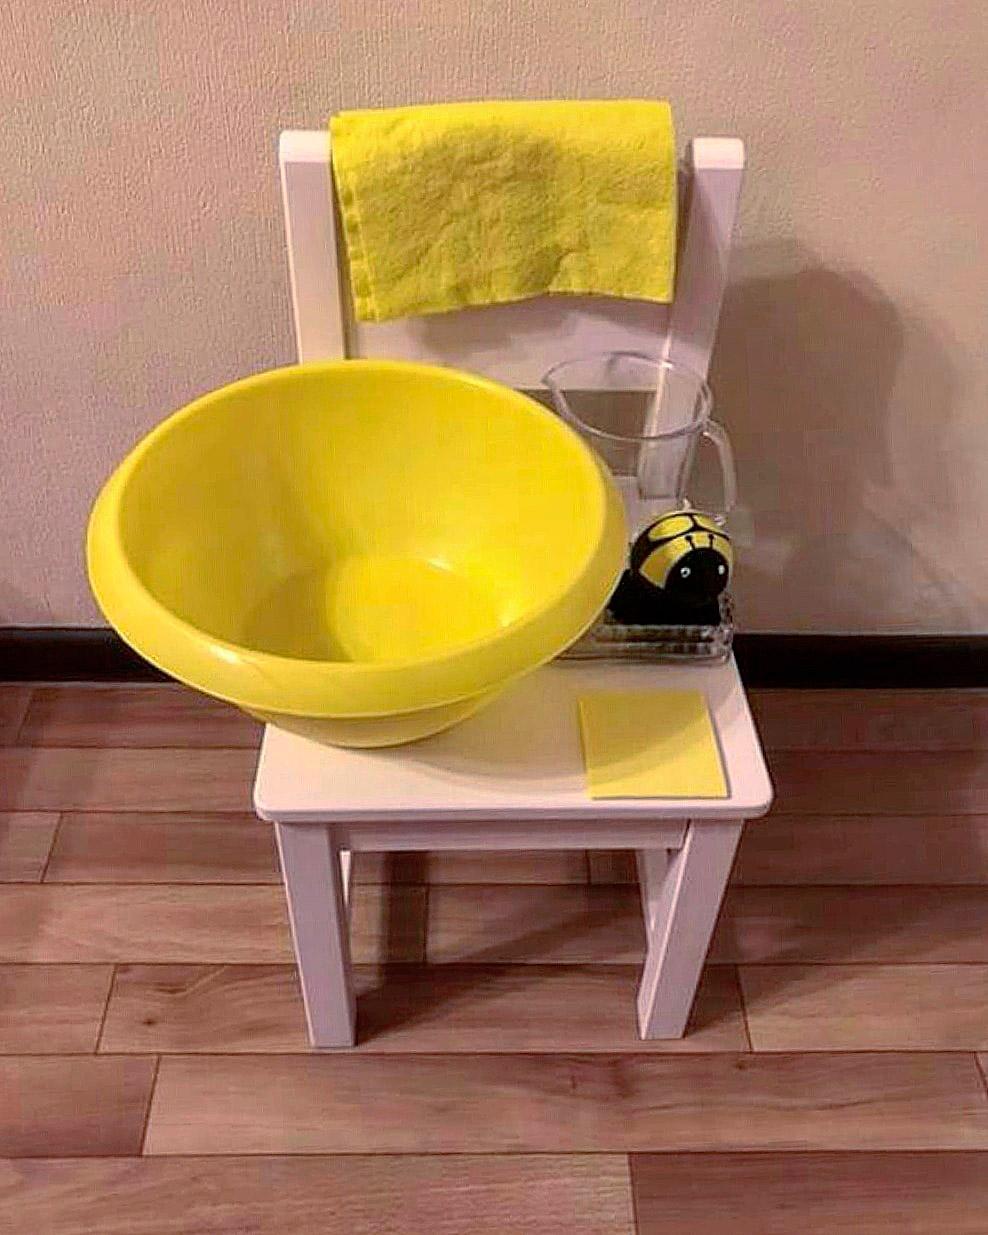 Мытье стола